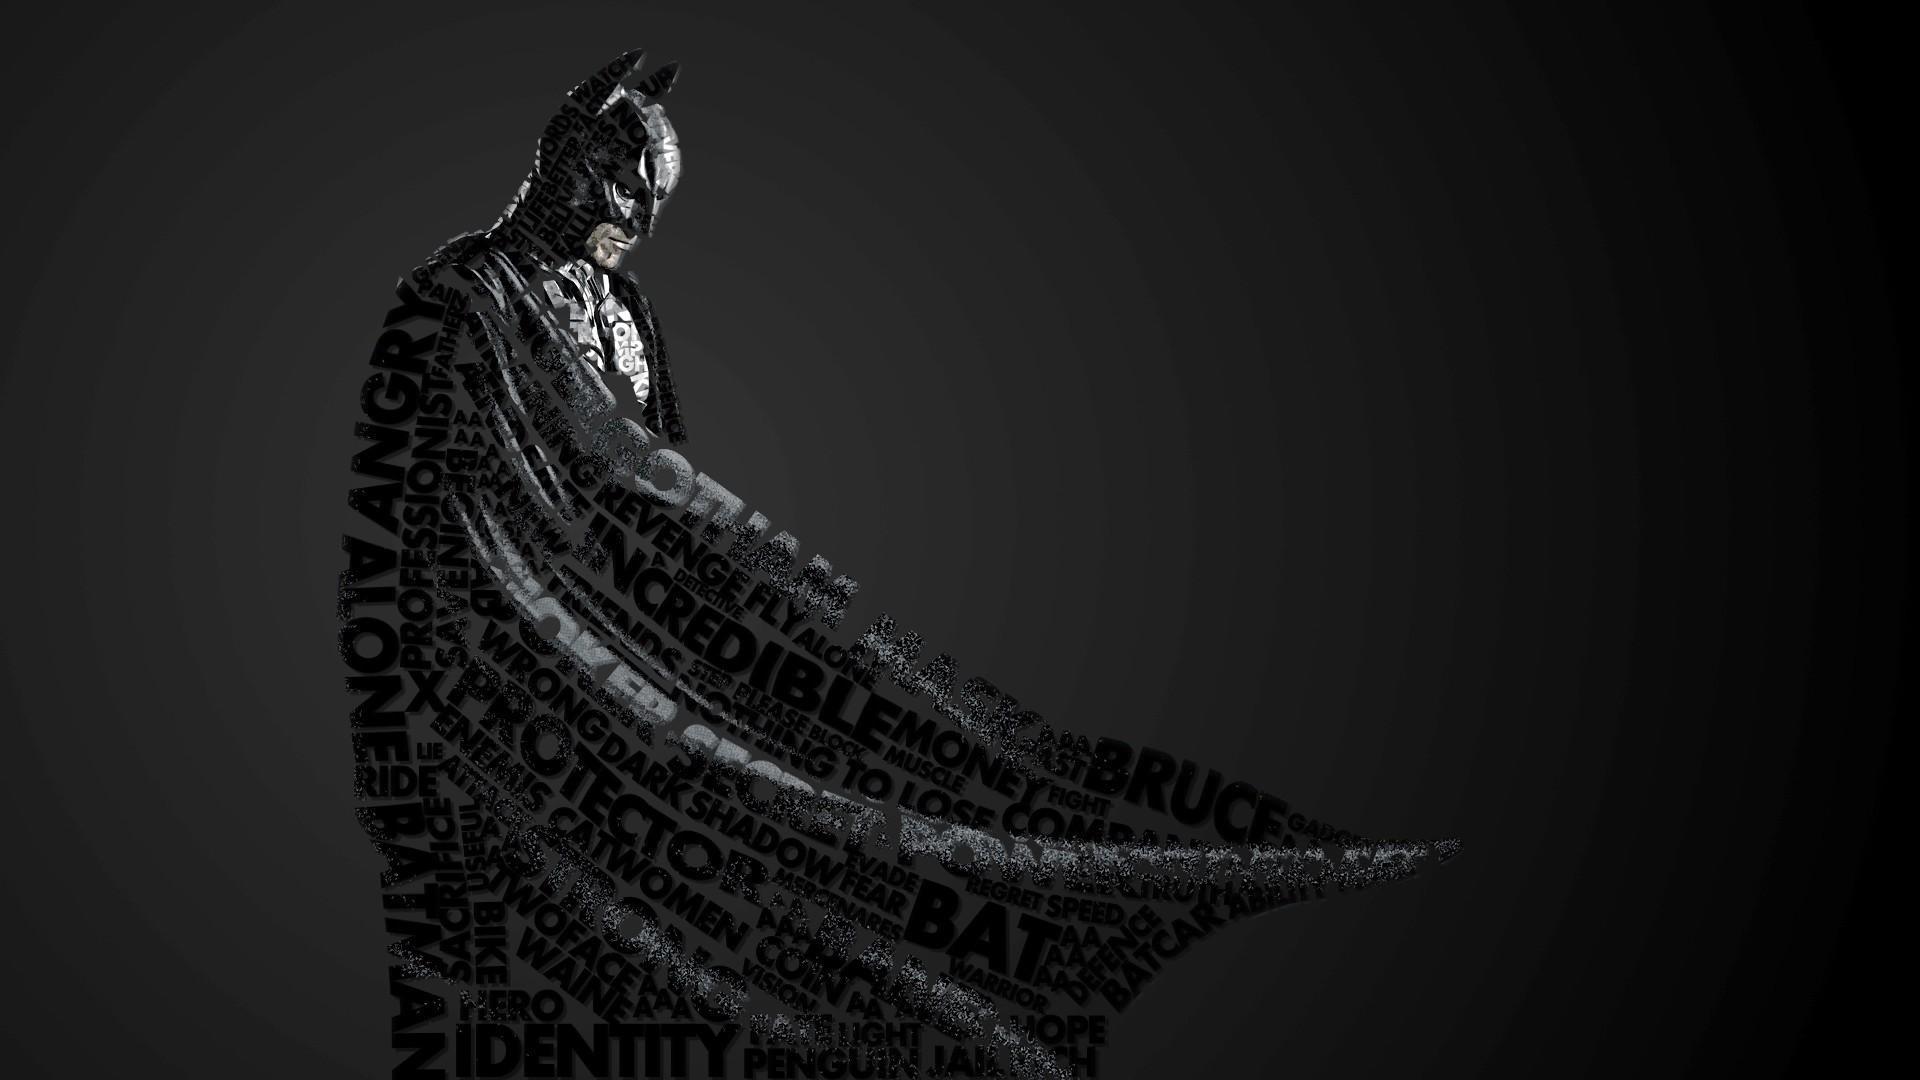 Batman Dark Knight Rises wallpapers and stock photos